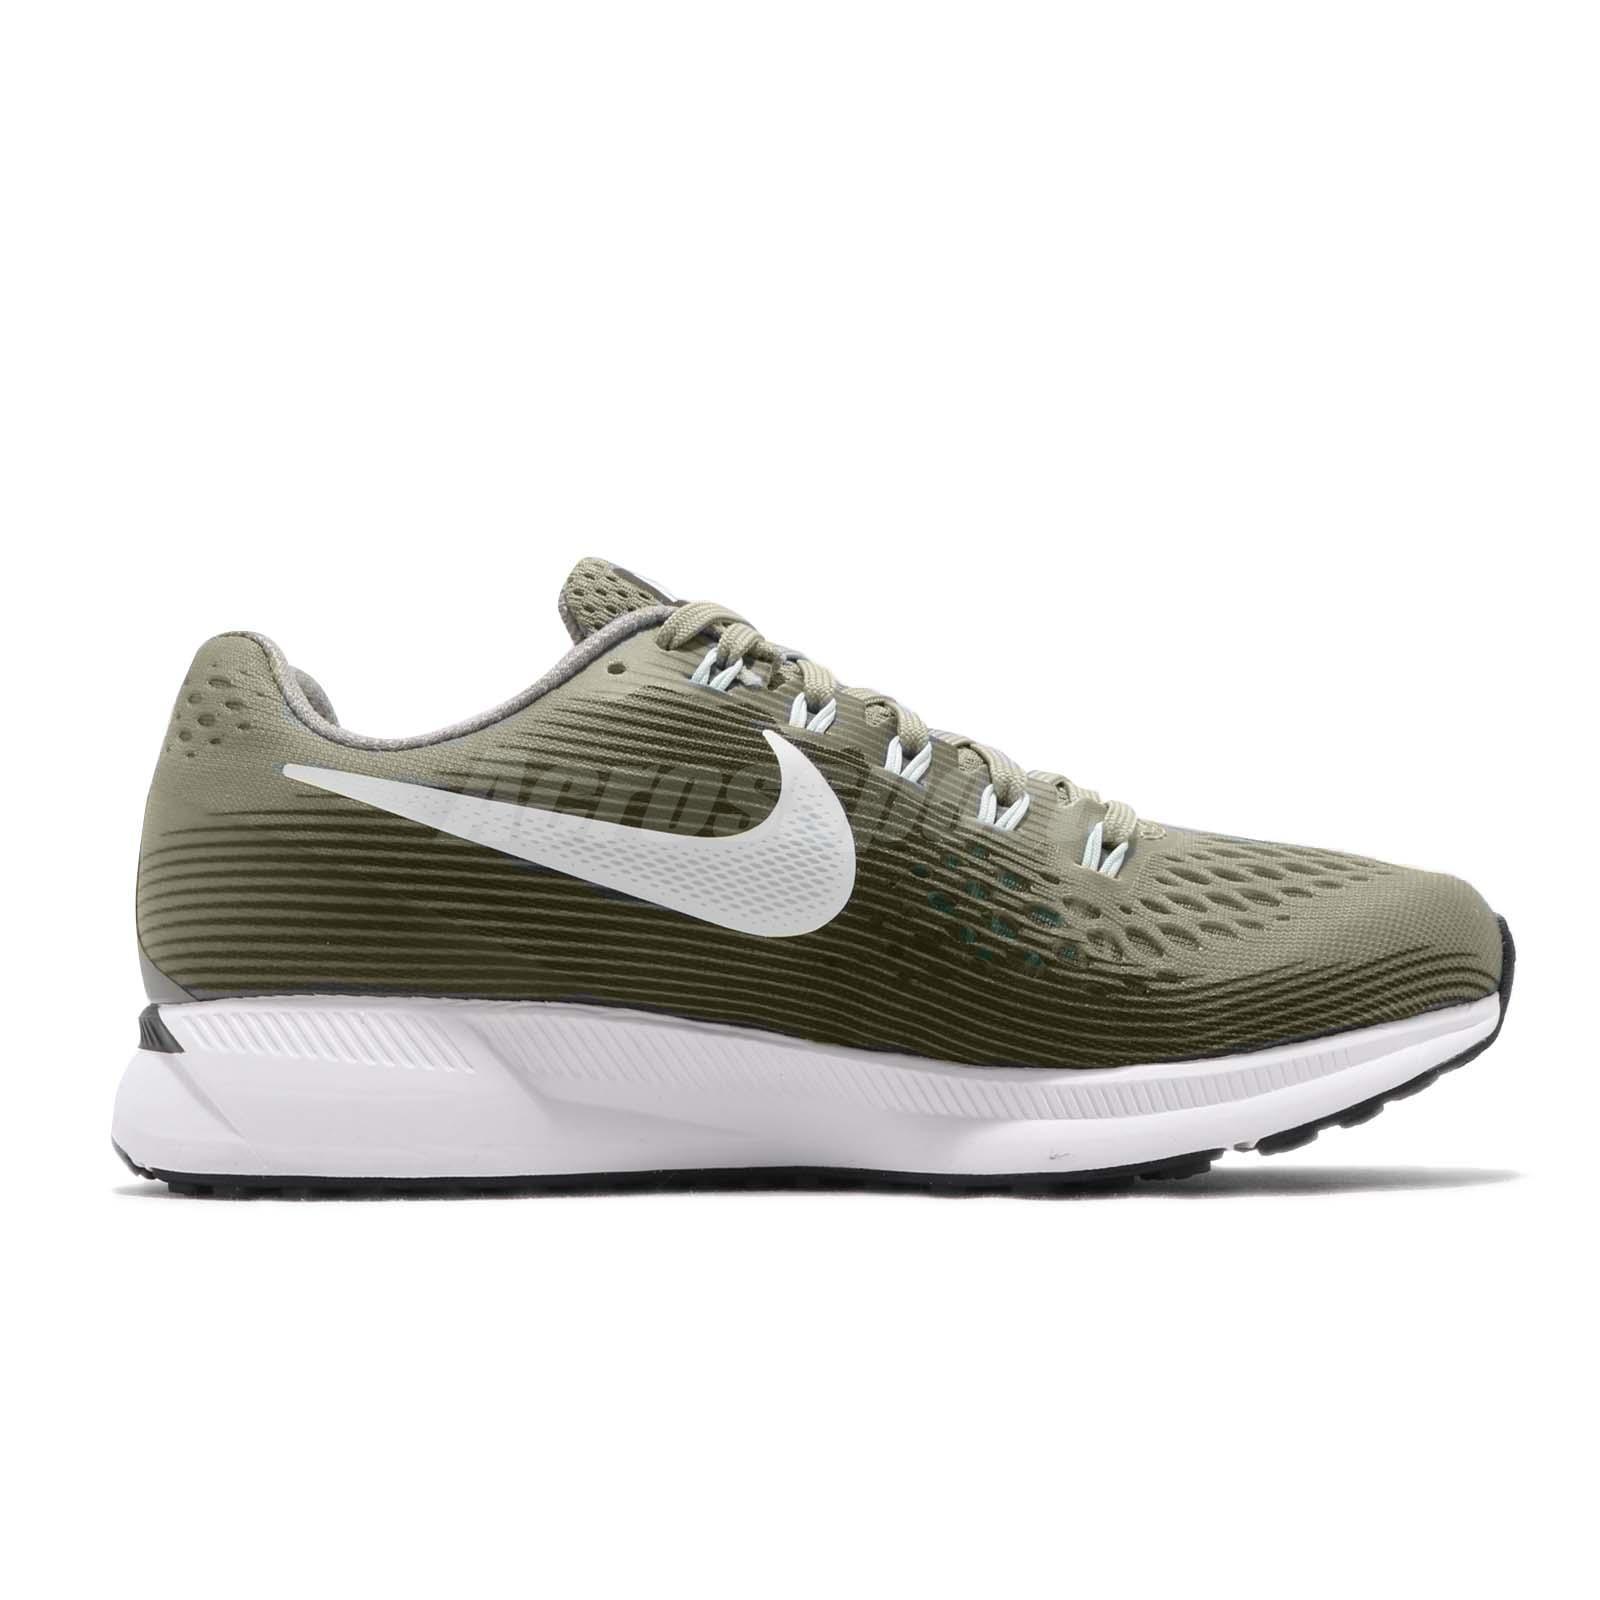 0d471eba8e9a Nike Wmns Air Zoom Pegasus 34 Dark Stucco Green Women Running Shoes ...